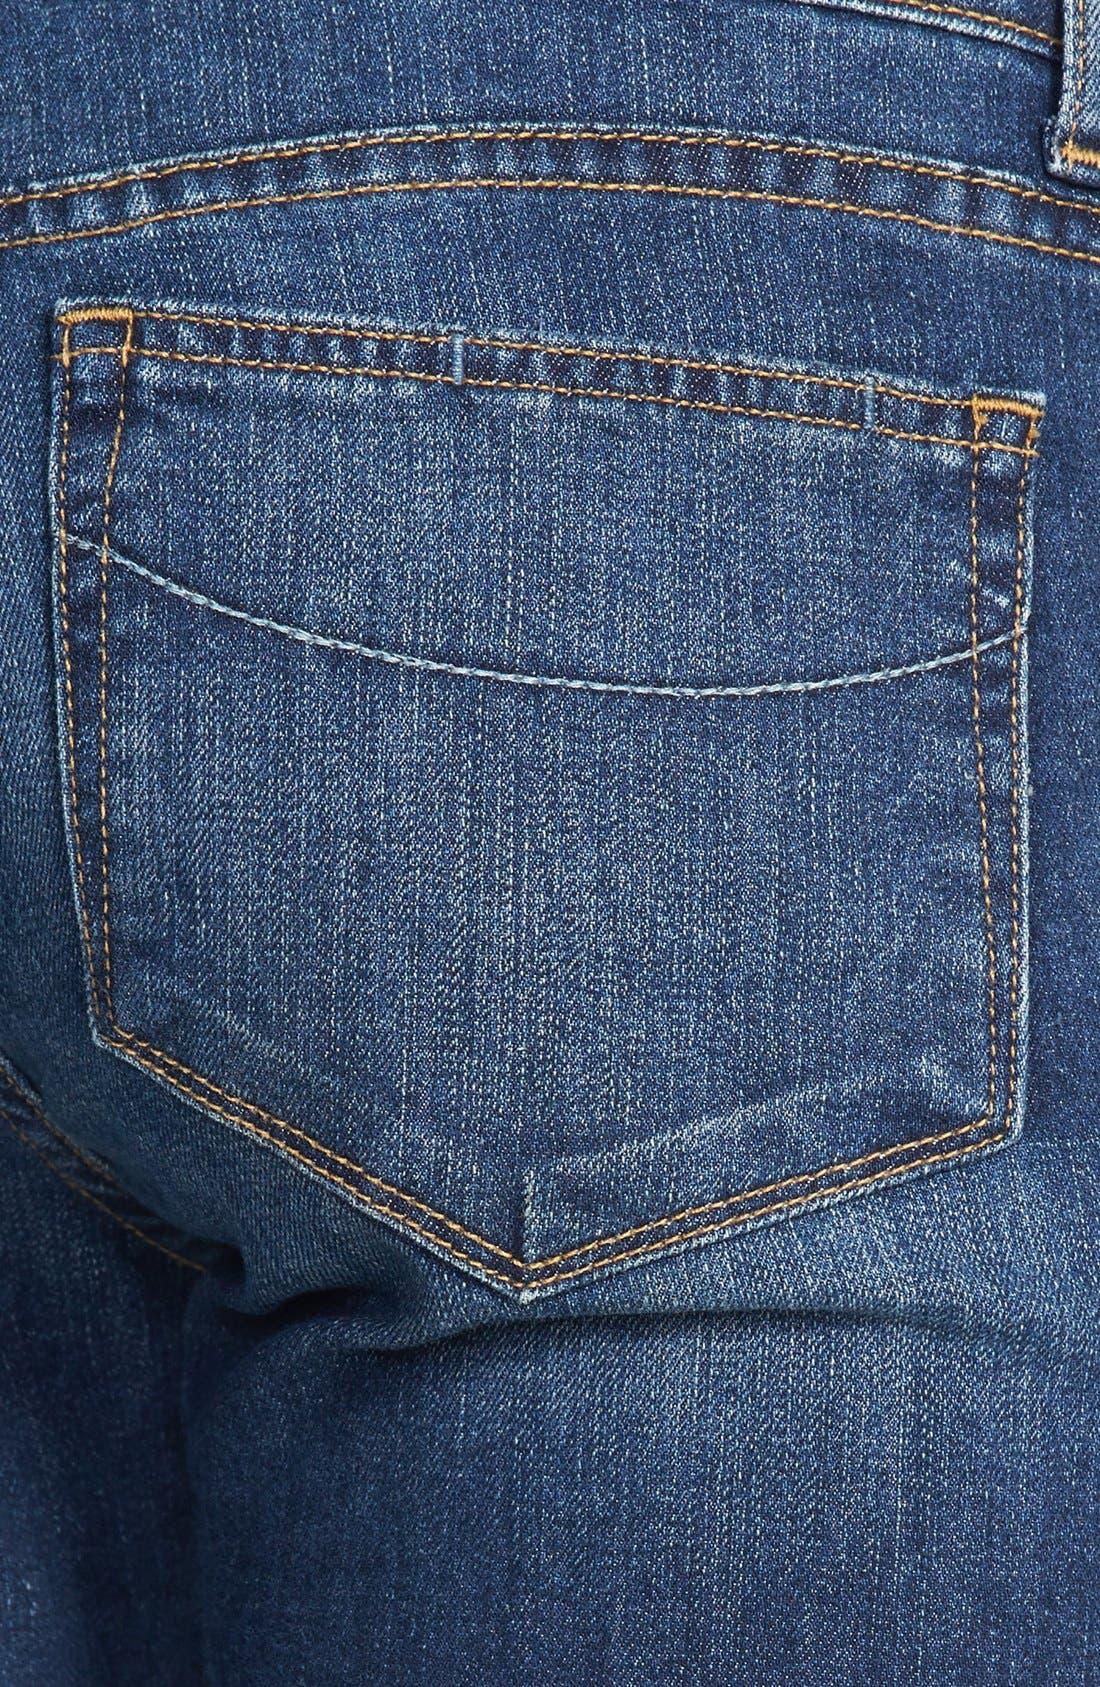 Alternate Image 3  - Paige Denim 'Jimmy Jimmy' Crop Skinny Jeans (Rebecca)